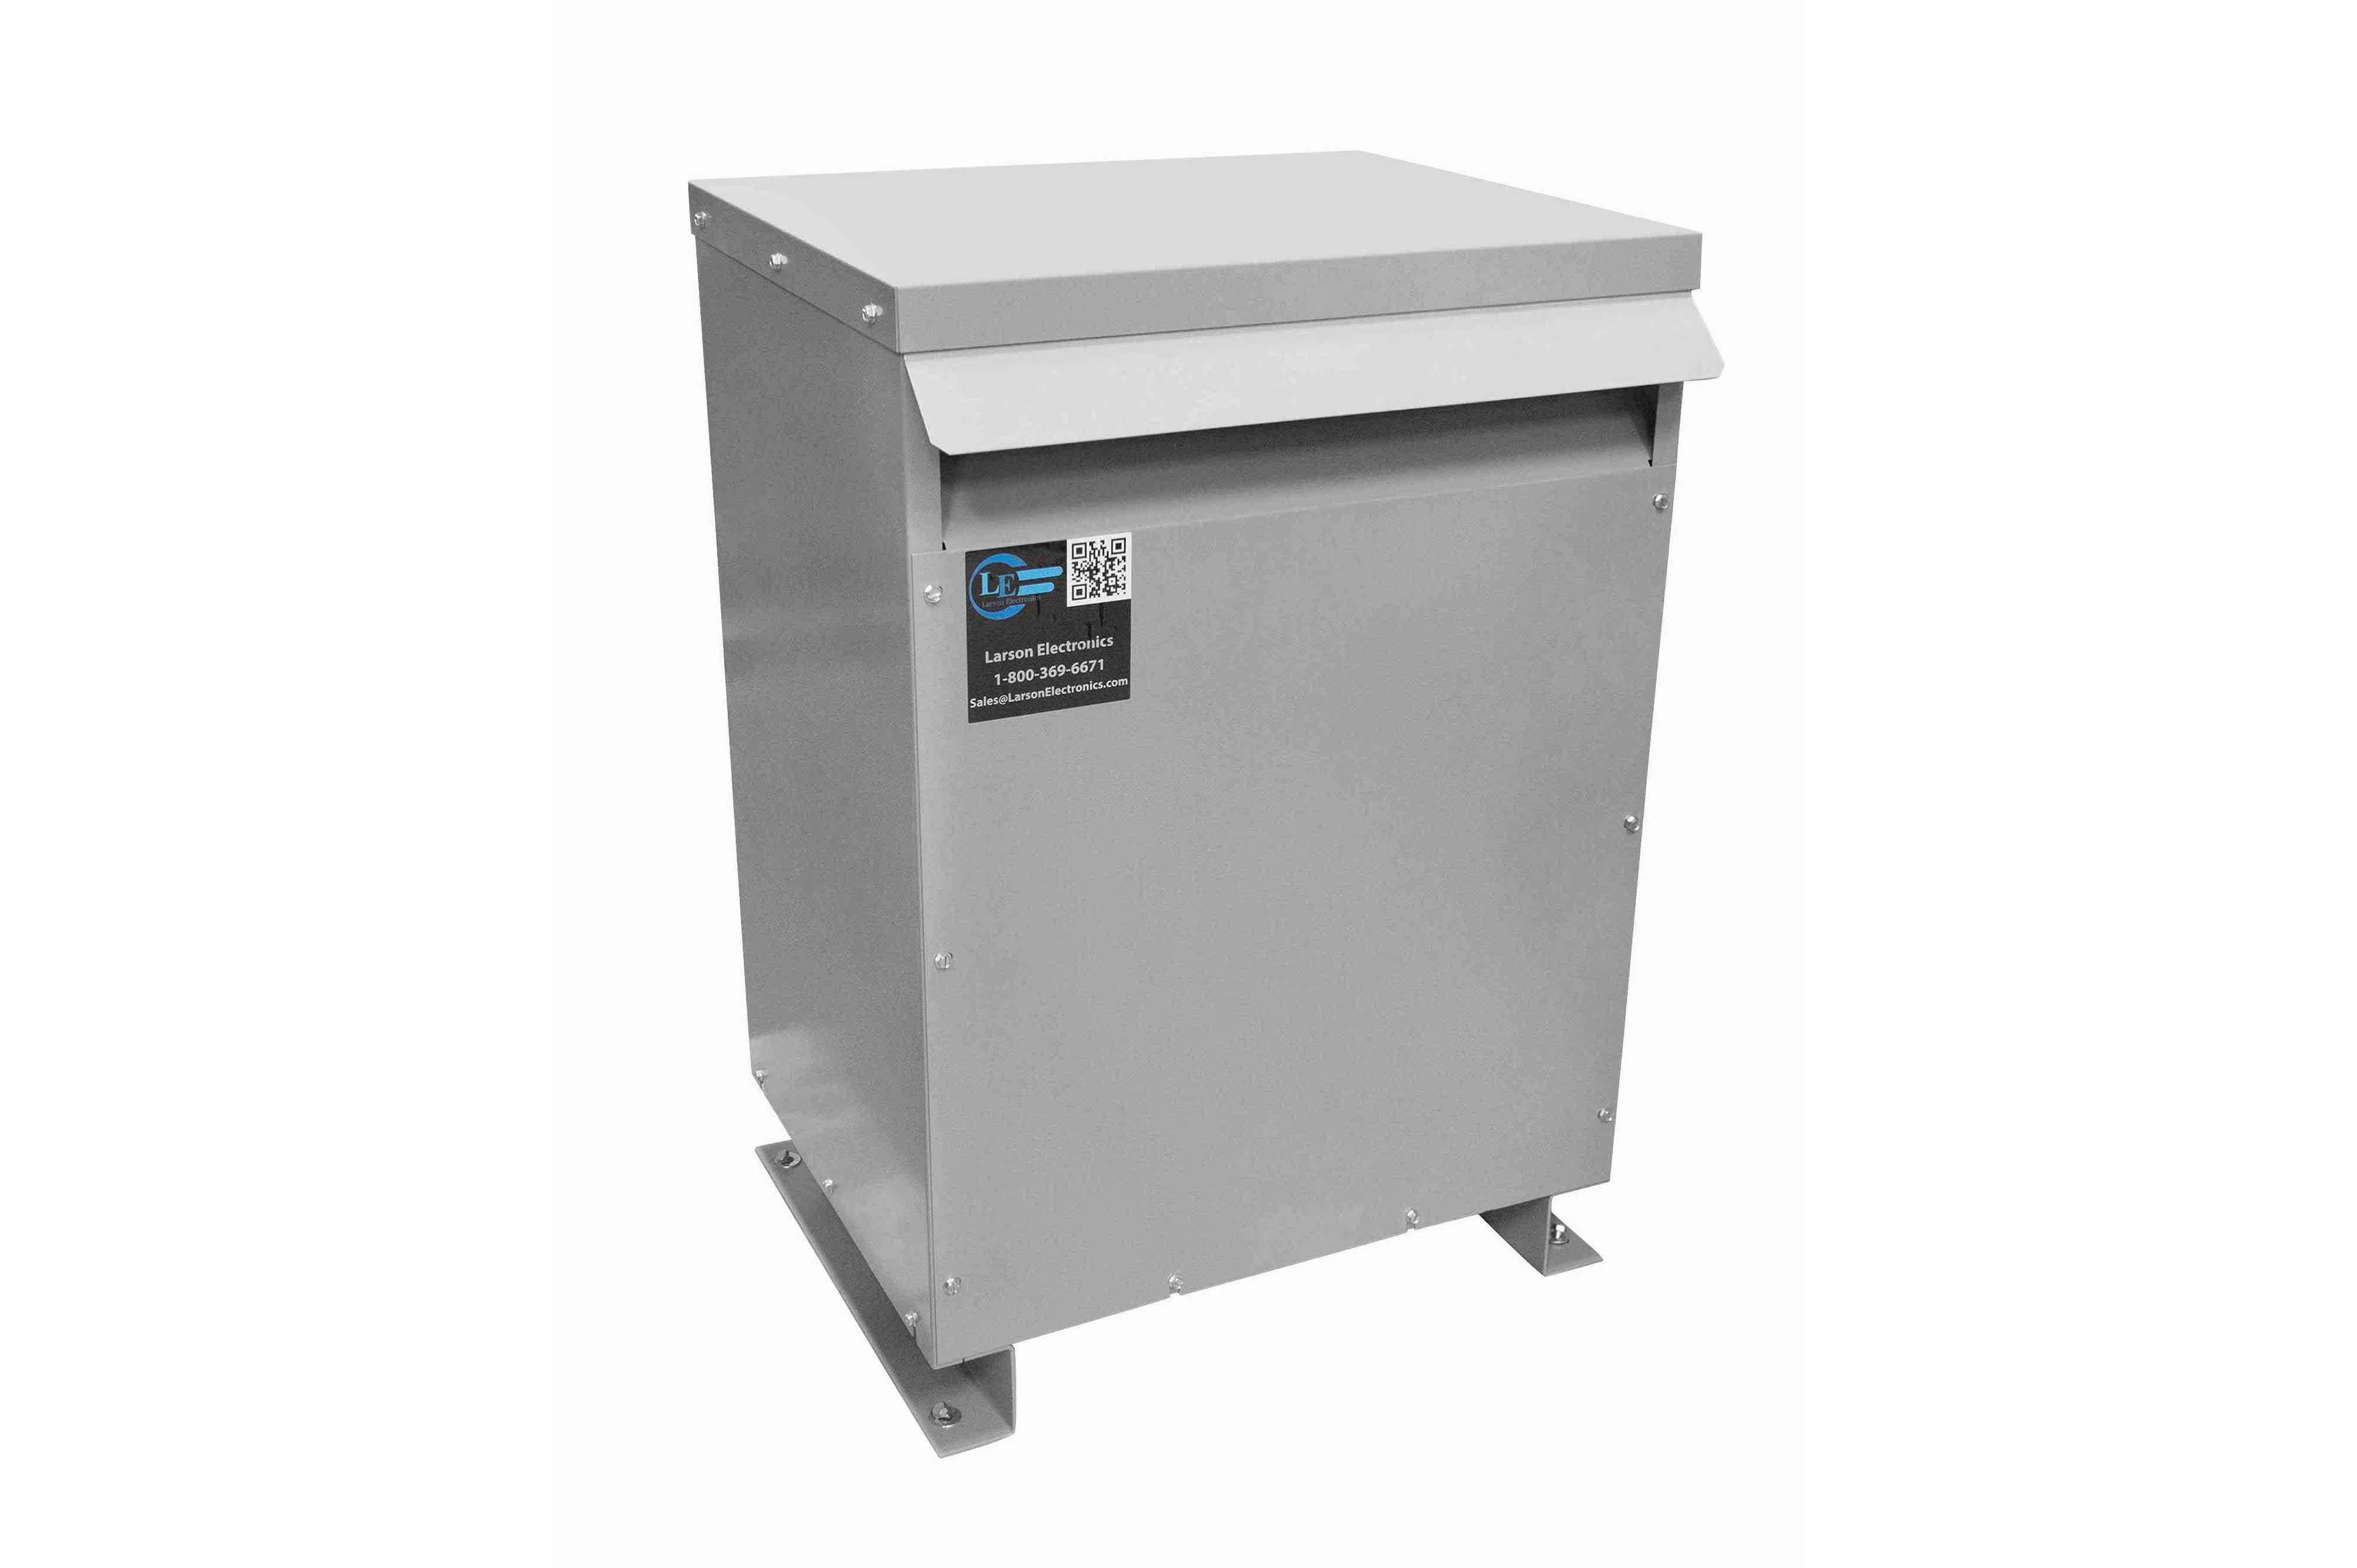 70 kVA 3PH Isolation Transformer, 600V Wye Primary, 480Y/277 Wye-N Secondary, N3R, Ventilated, 60 Hz